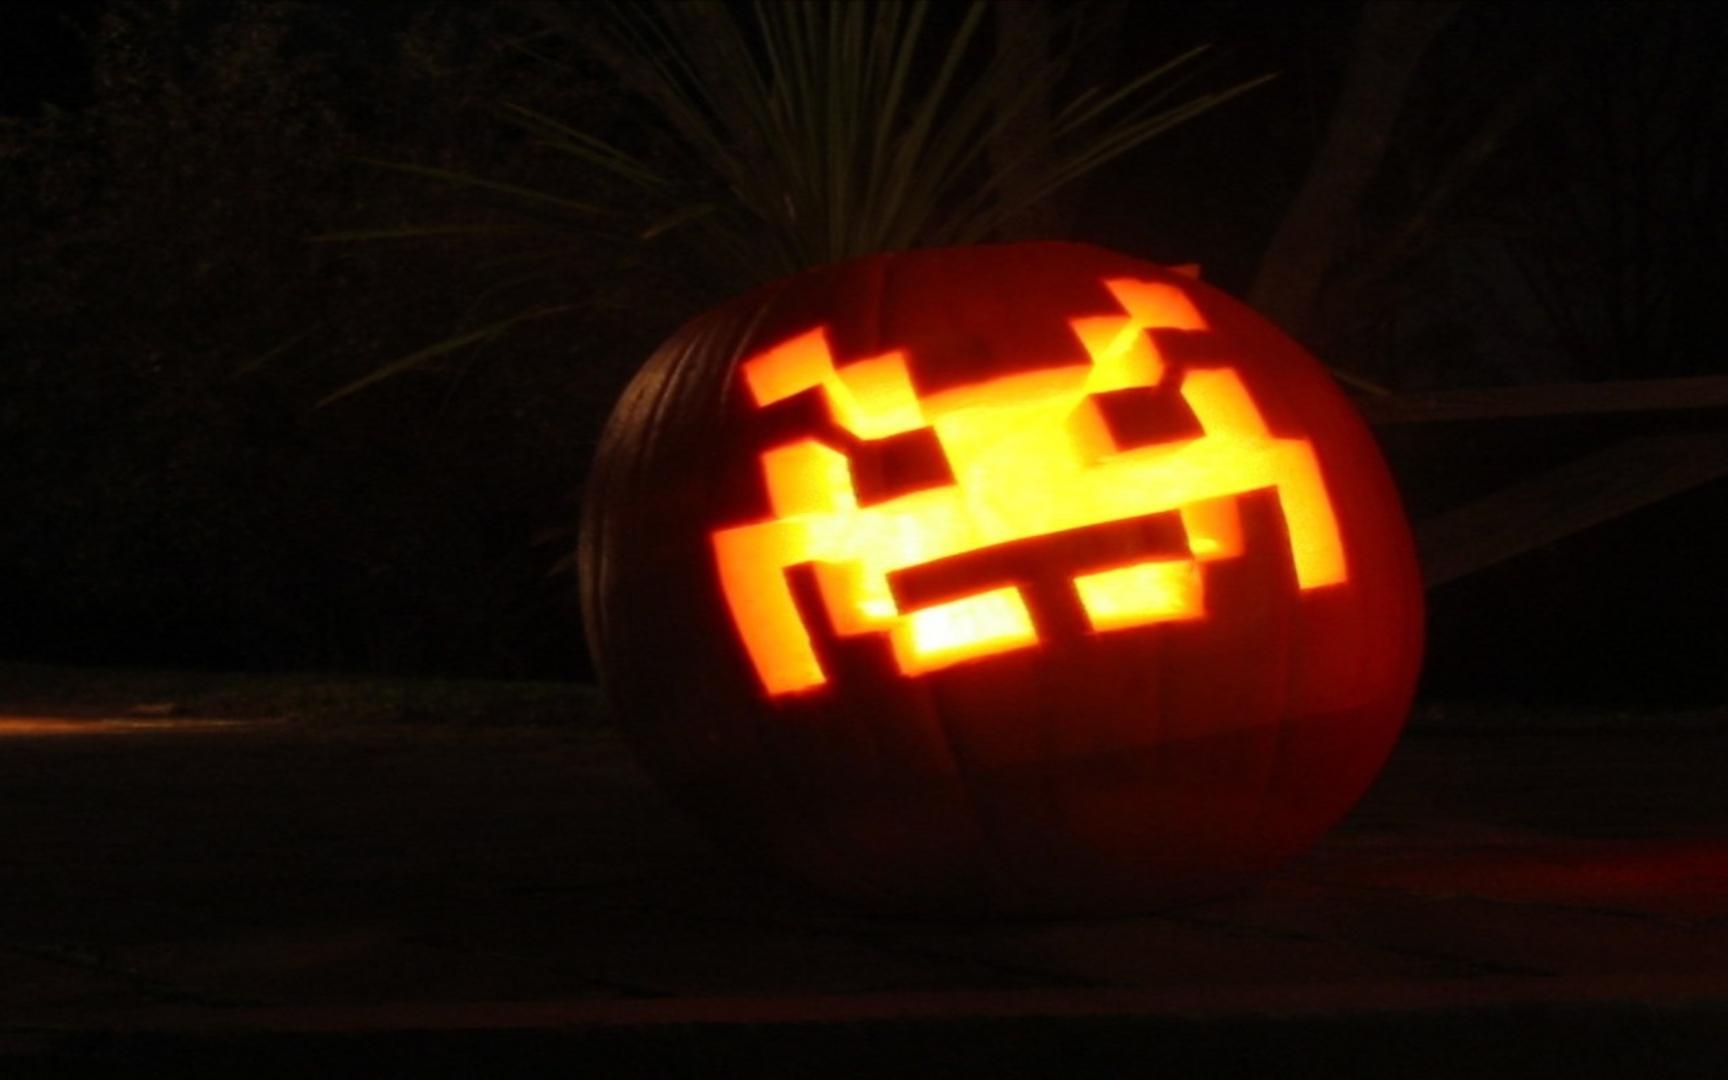 Diy creuser une citrouille lumineuse d 39 halloween fa on for Top pumpkin carving ideas